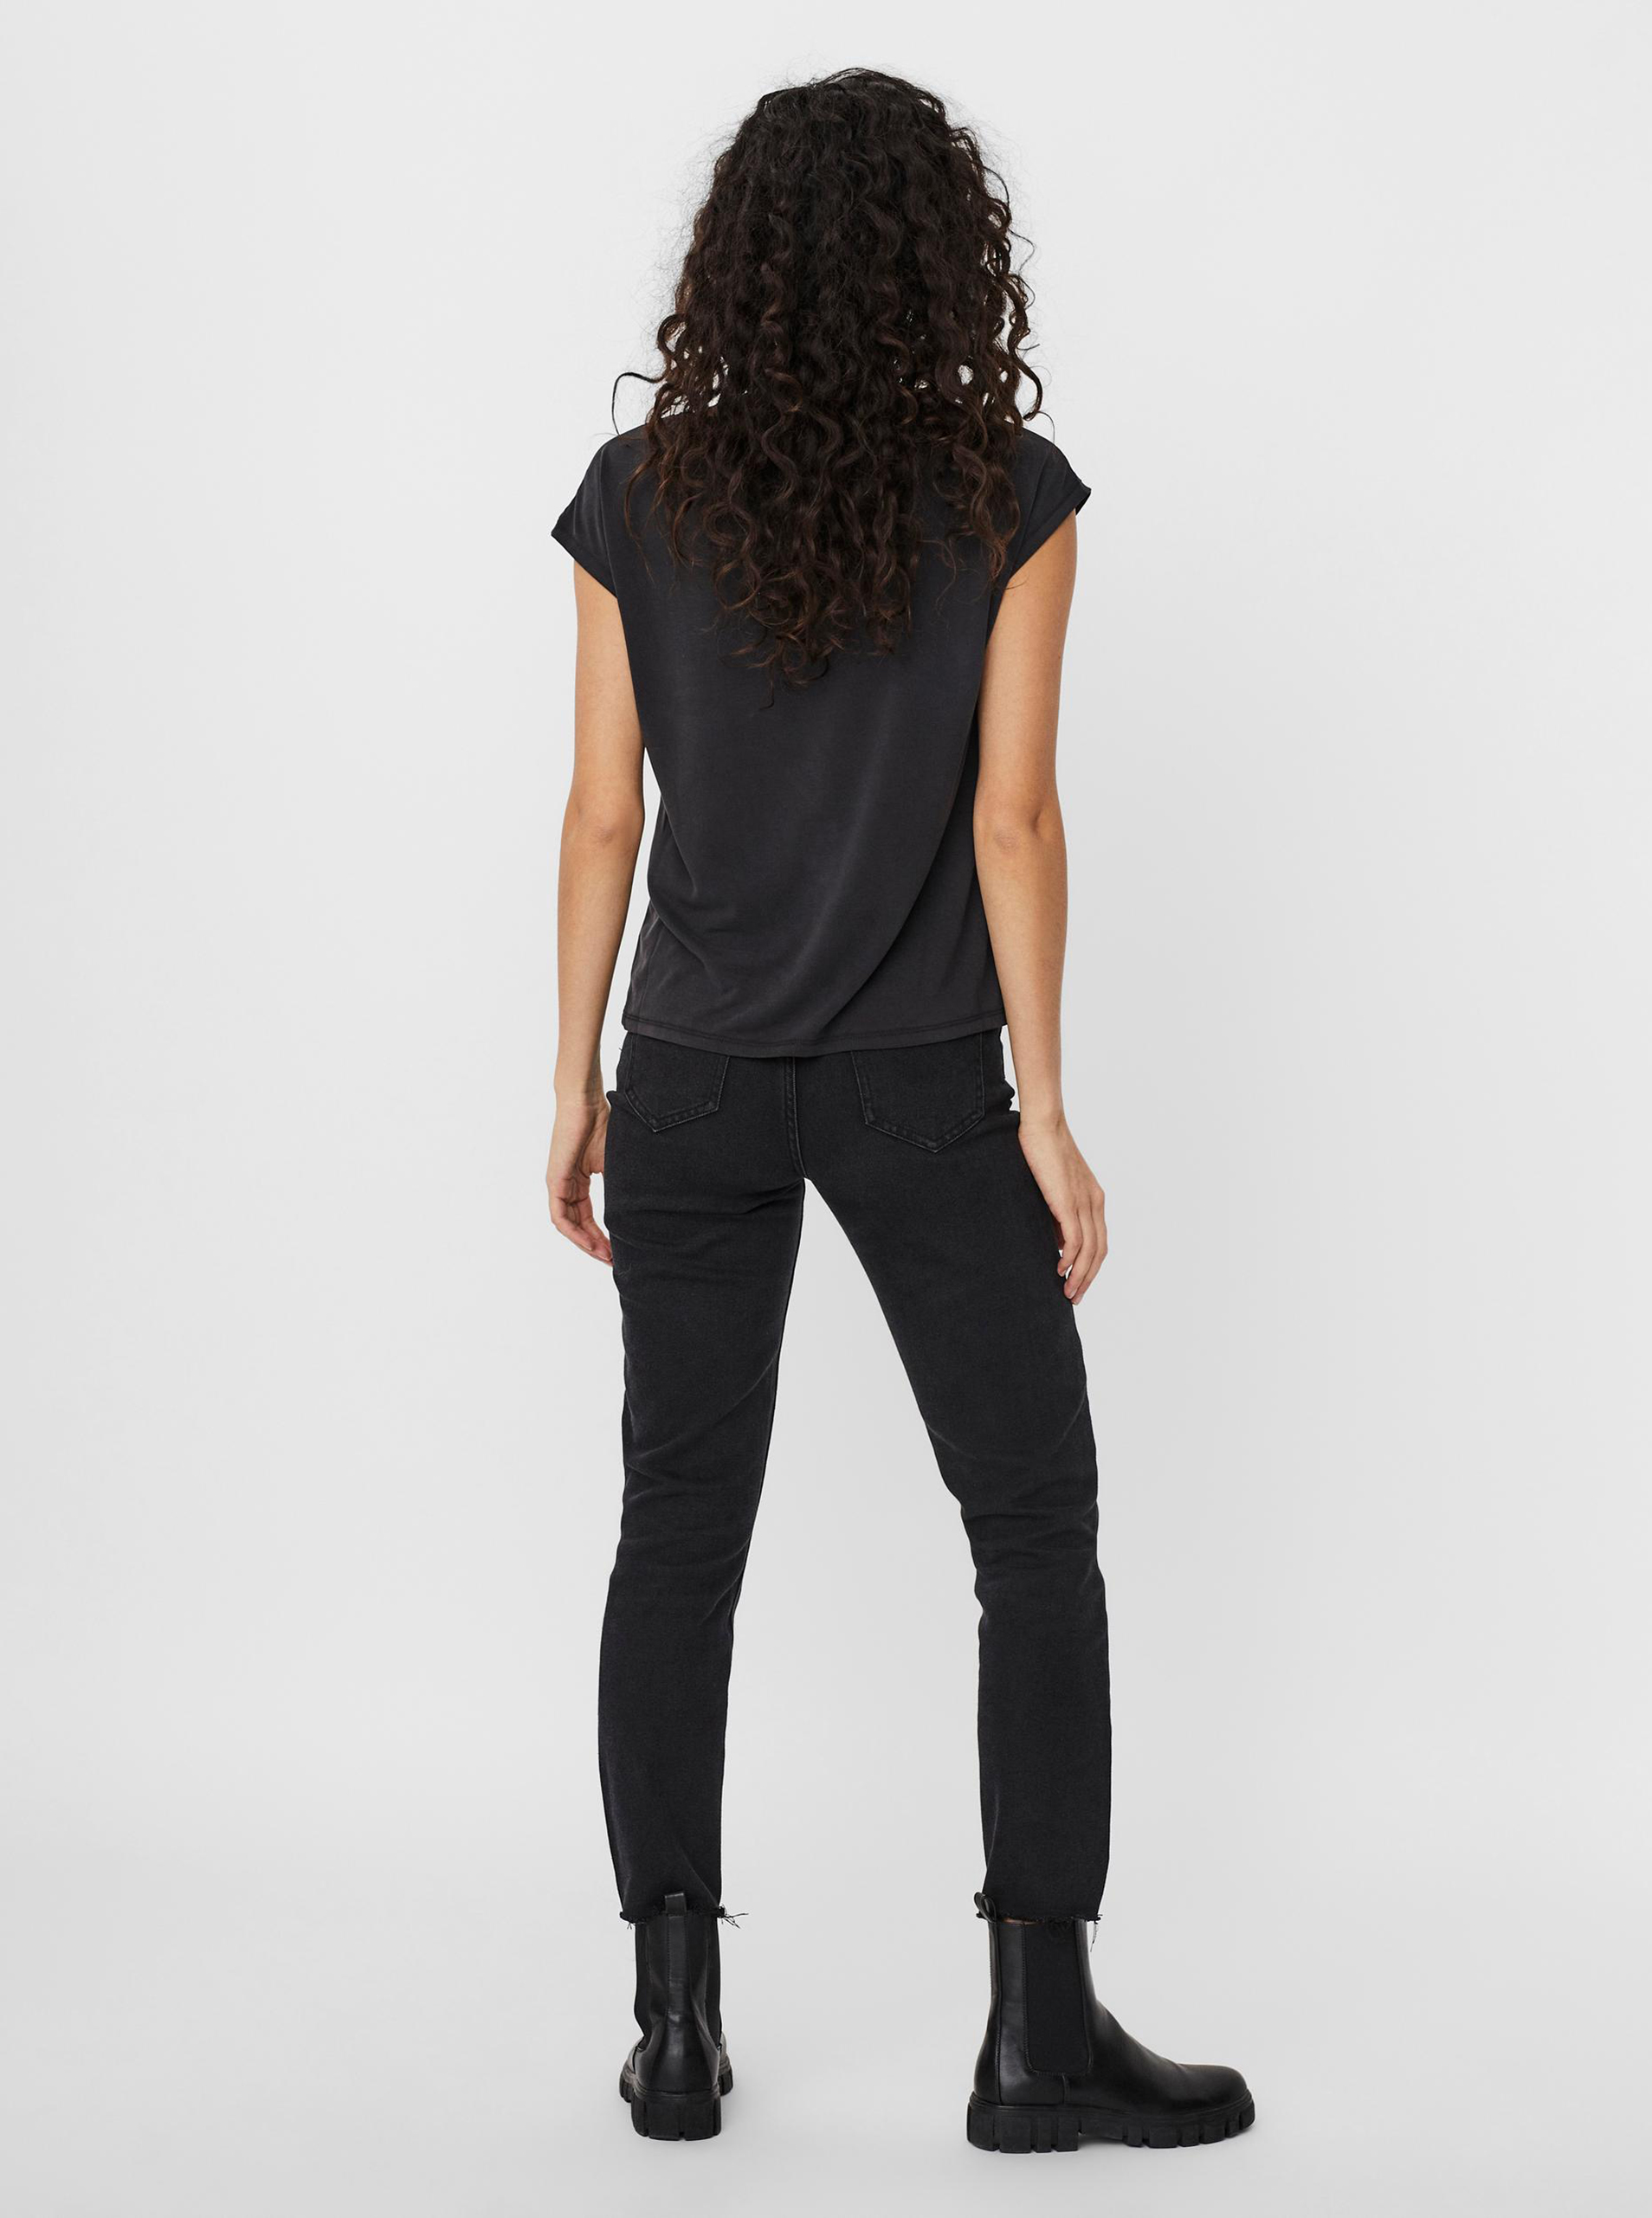 Vero Moda černé tričko Filli